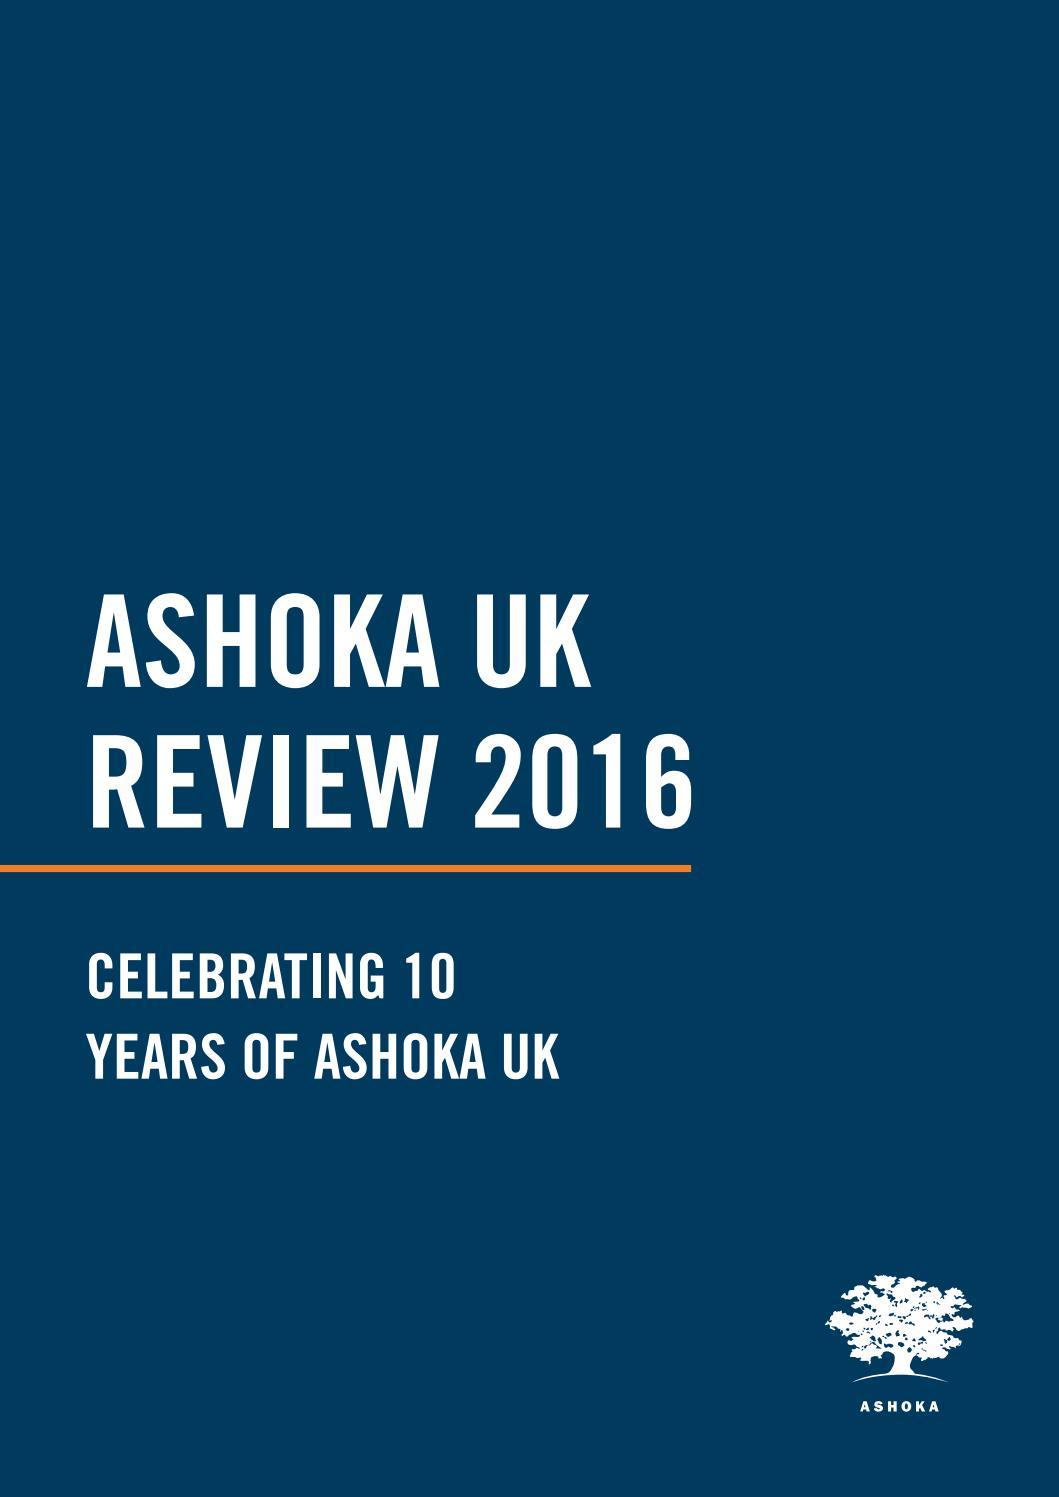 Ashoka UK Review 2016 by Ashoka Changemakers - issuu